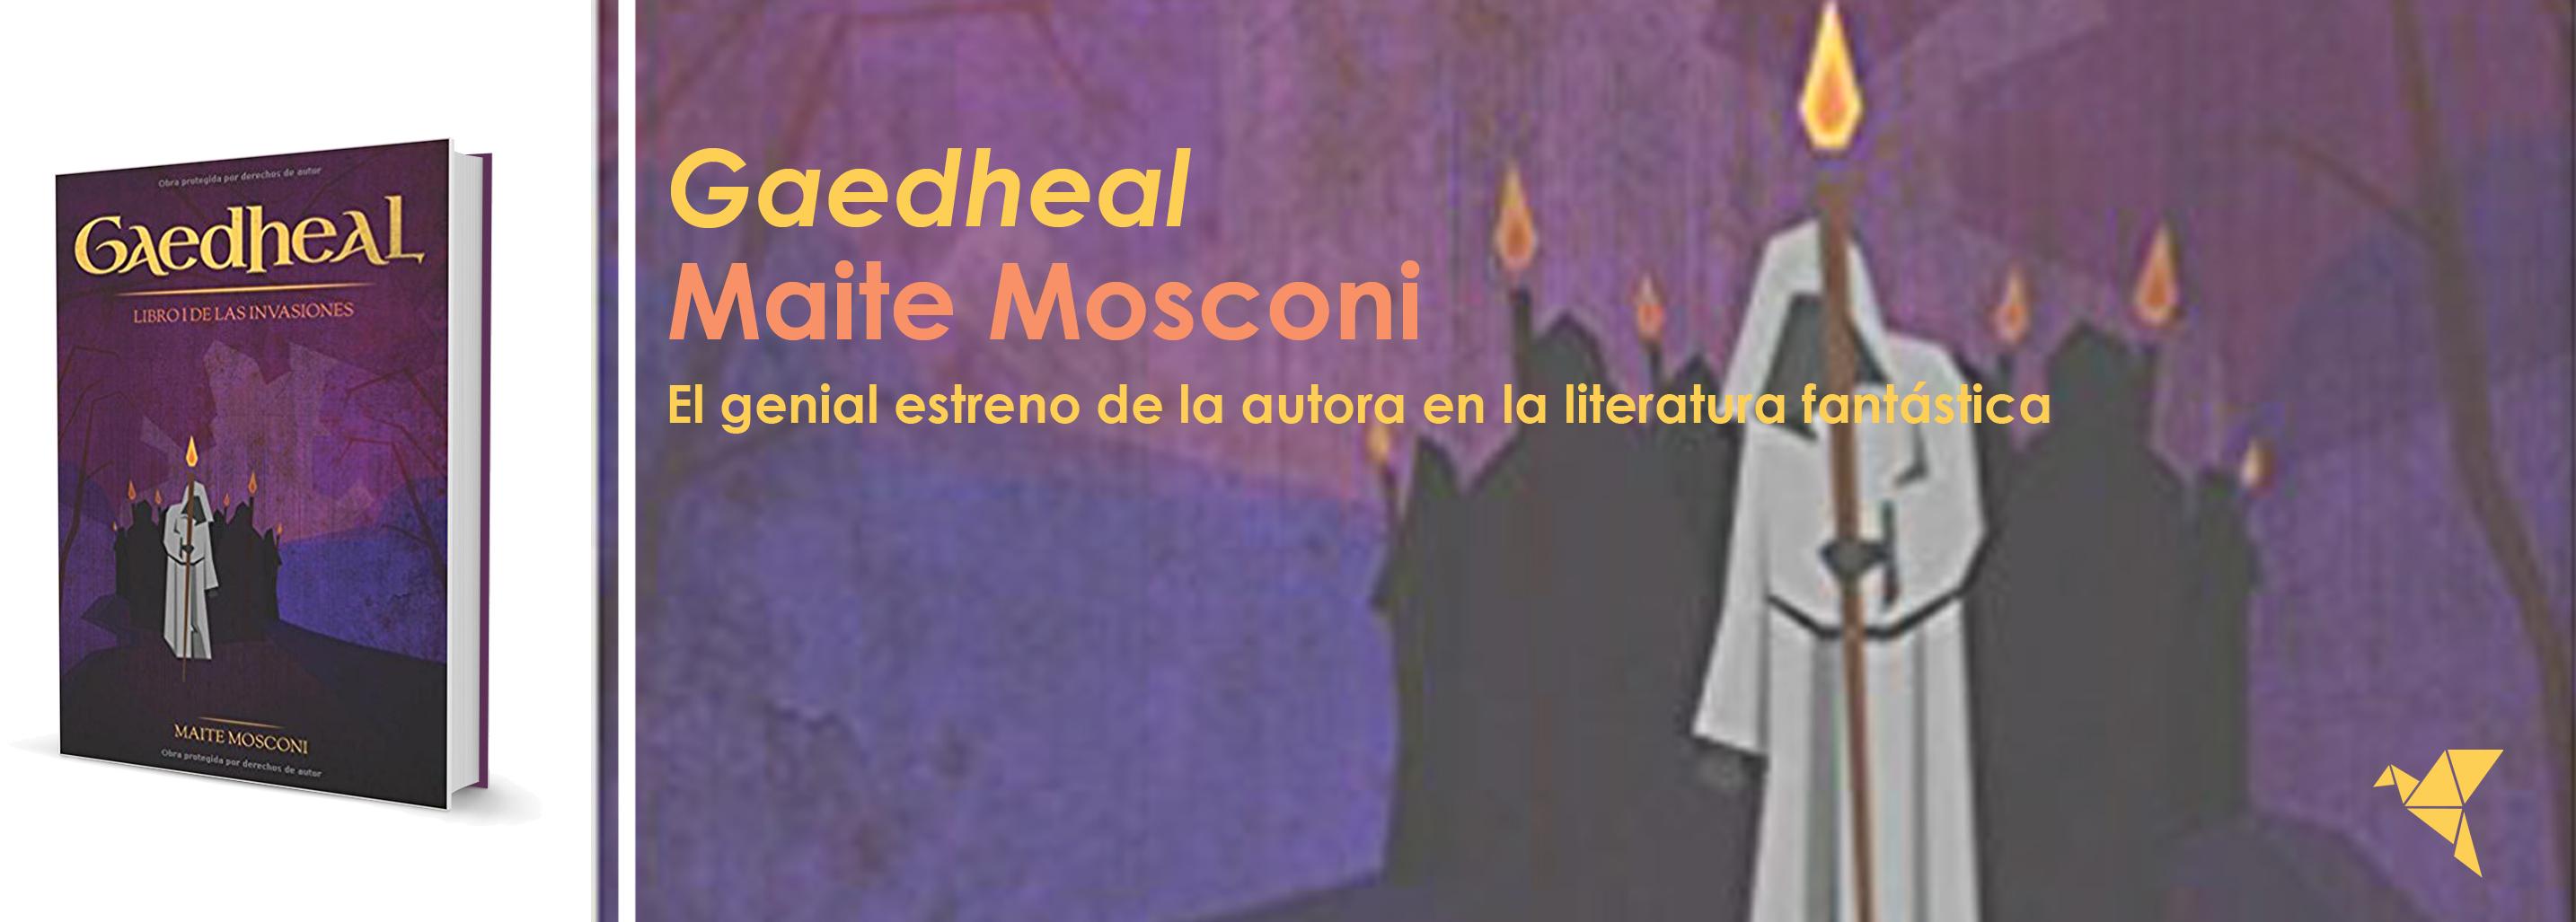 Gaedheal, de Maite Mosconi